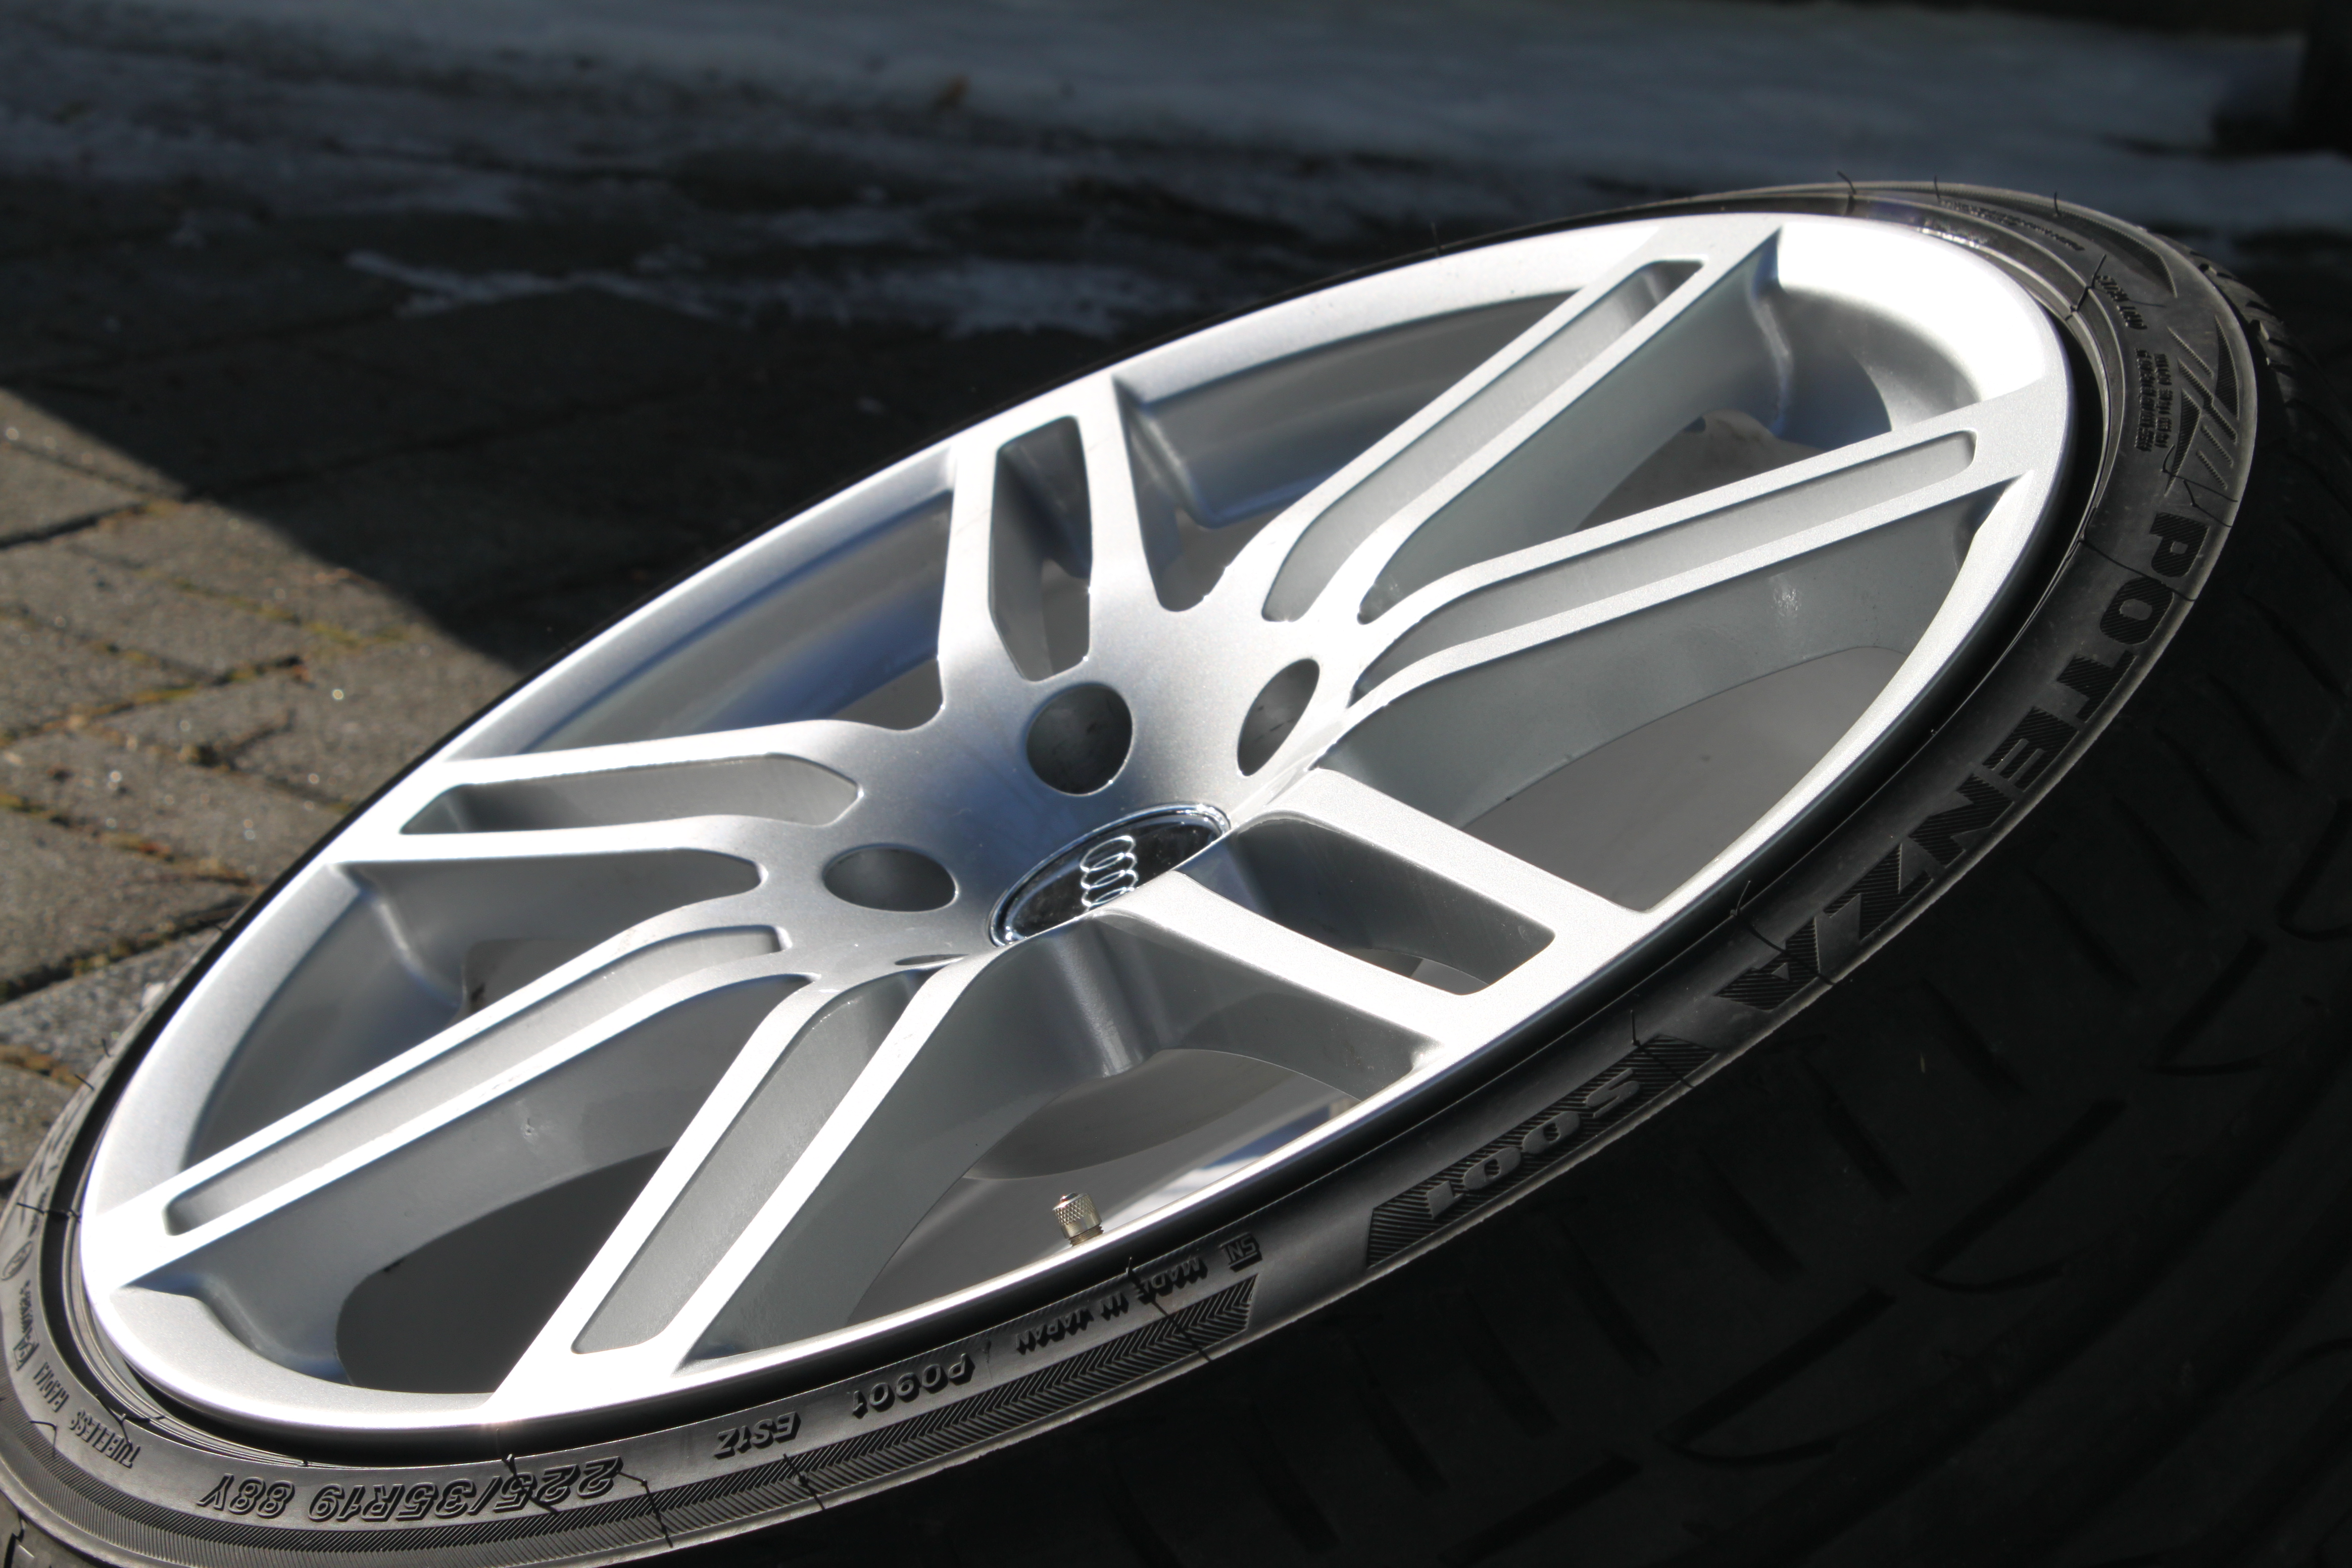 modul wheels md4 rs4 design 8 5x19 225 35 r19 audi a3 biete. Black Bedroom Furniture Sets. Home Design Ideas